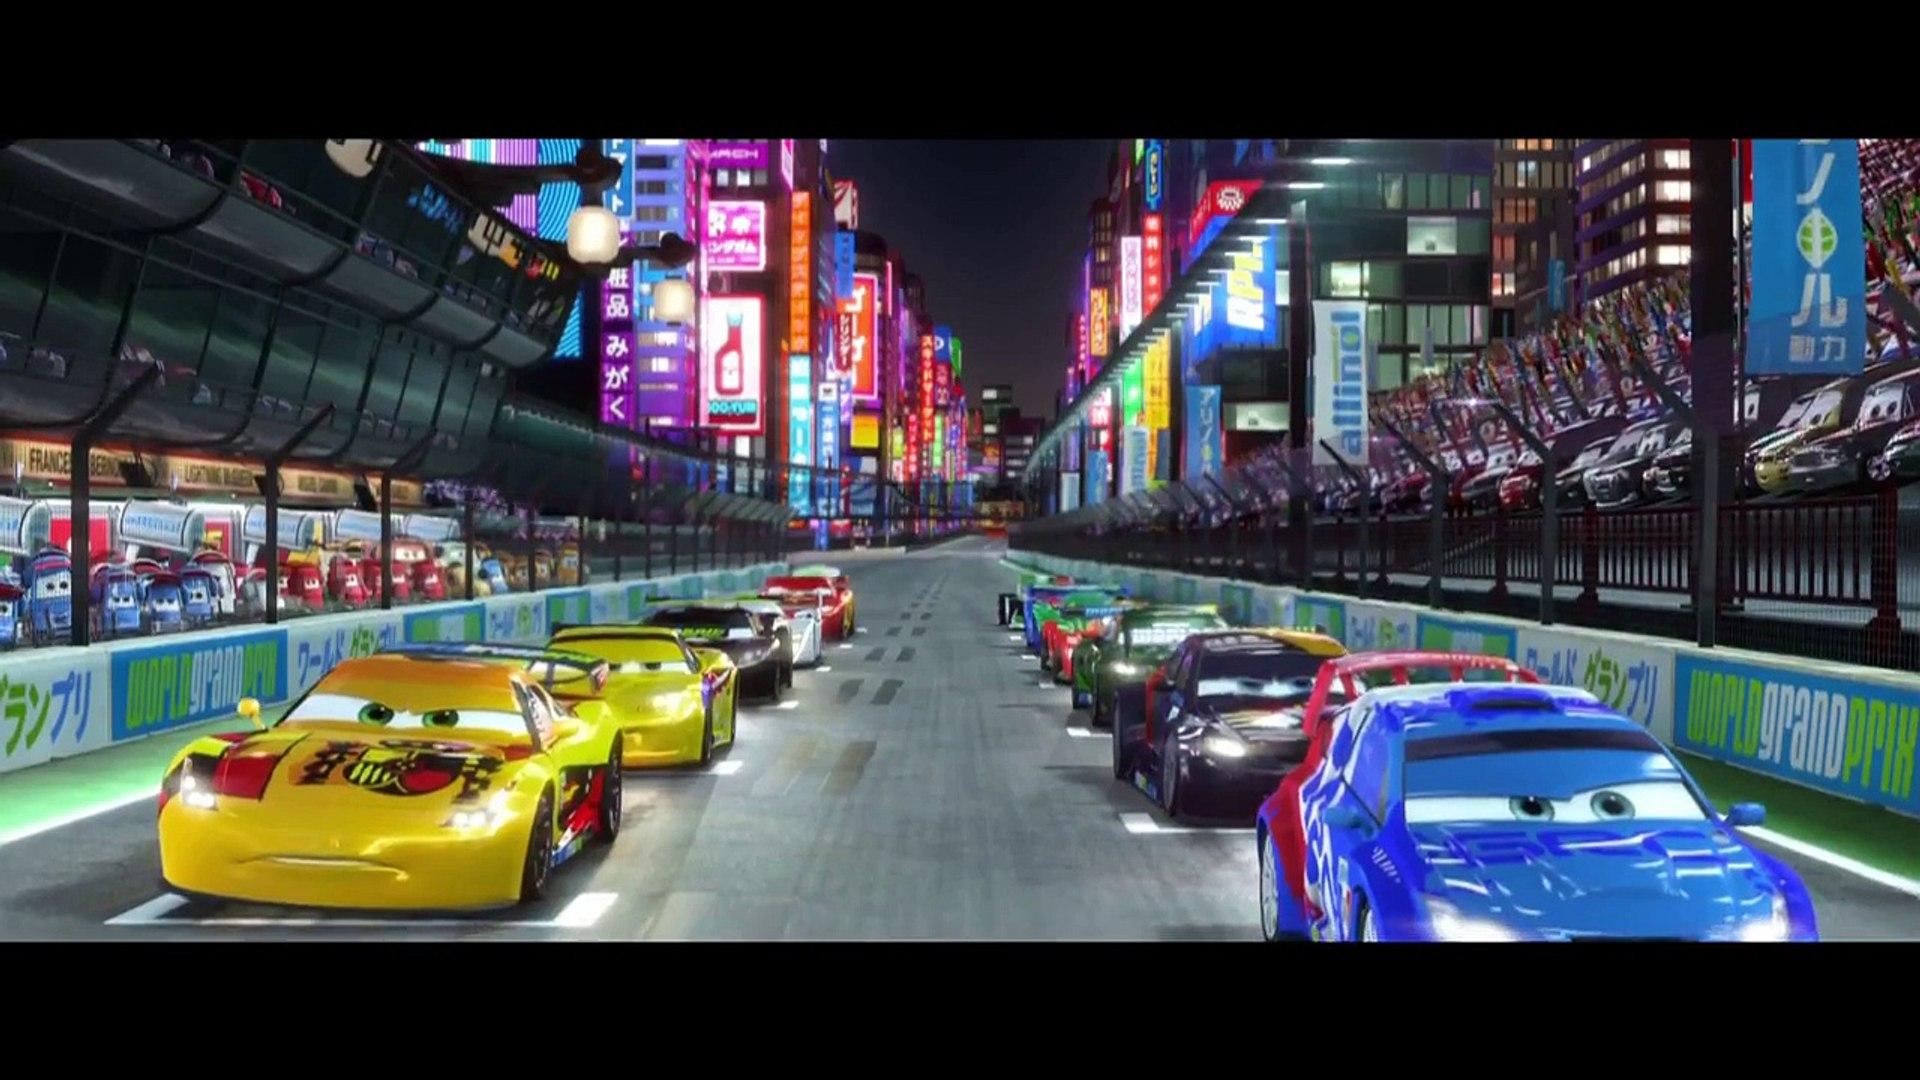 Family - CARS 2 - FEATURETTE | Owen Wilson, Larry The Cable Guy, Michael Caine